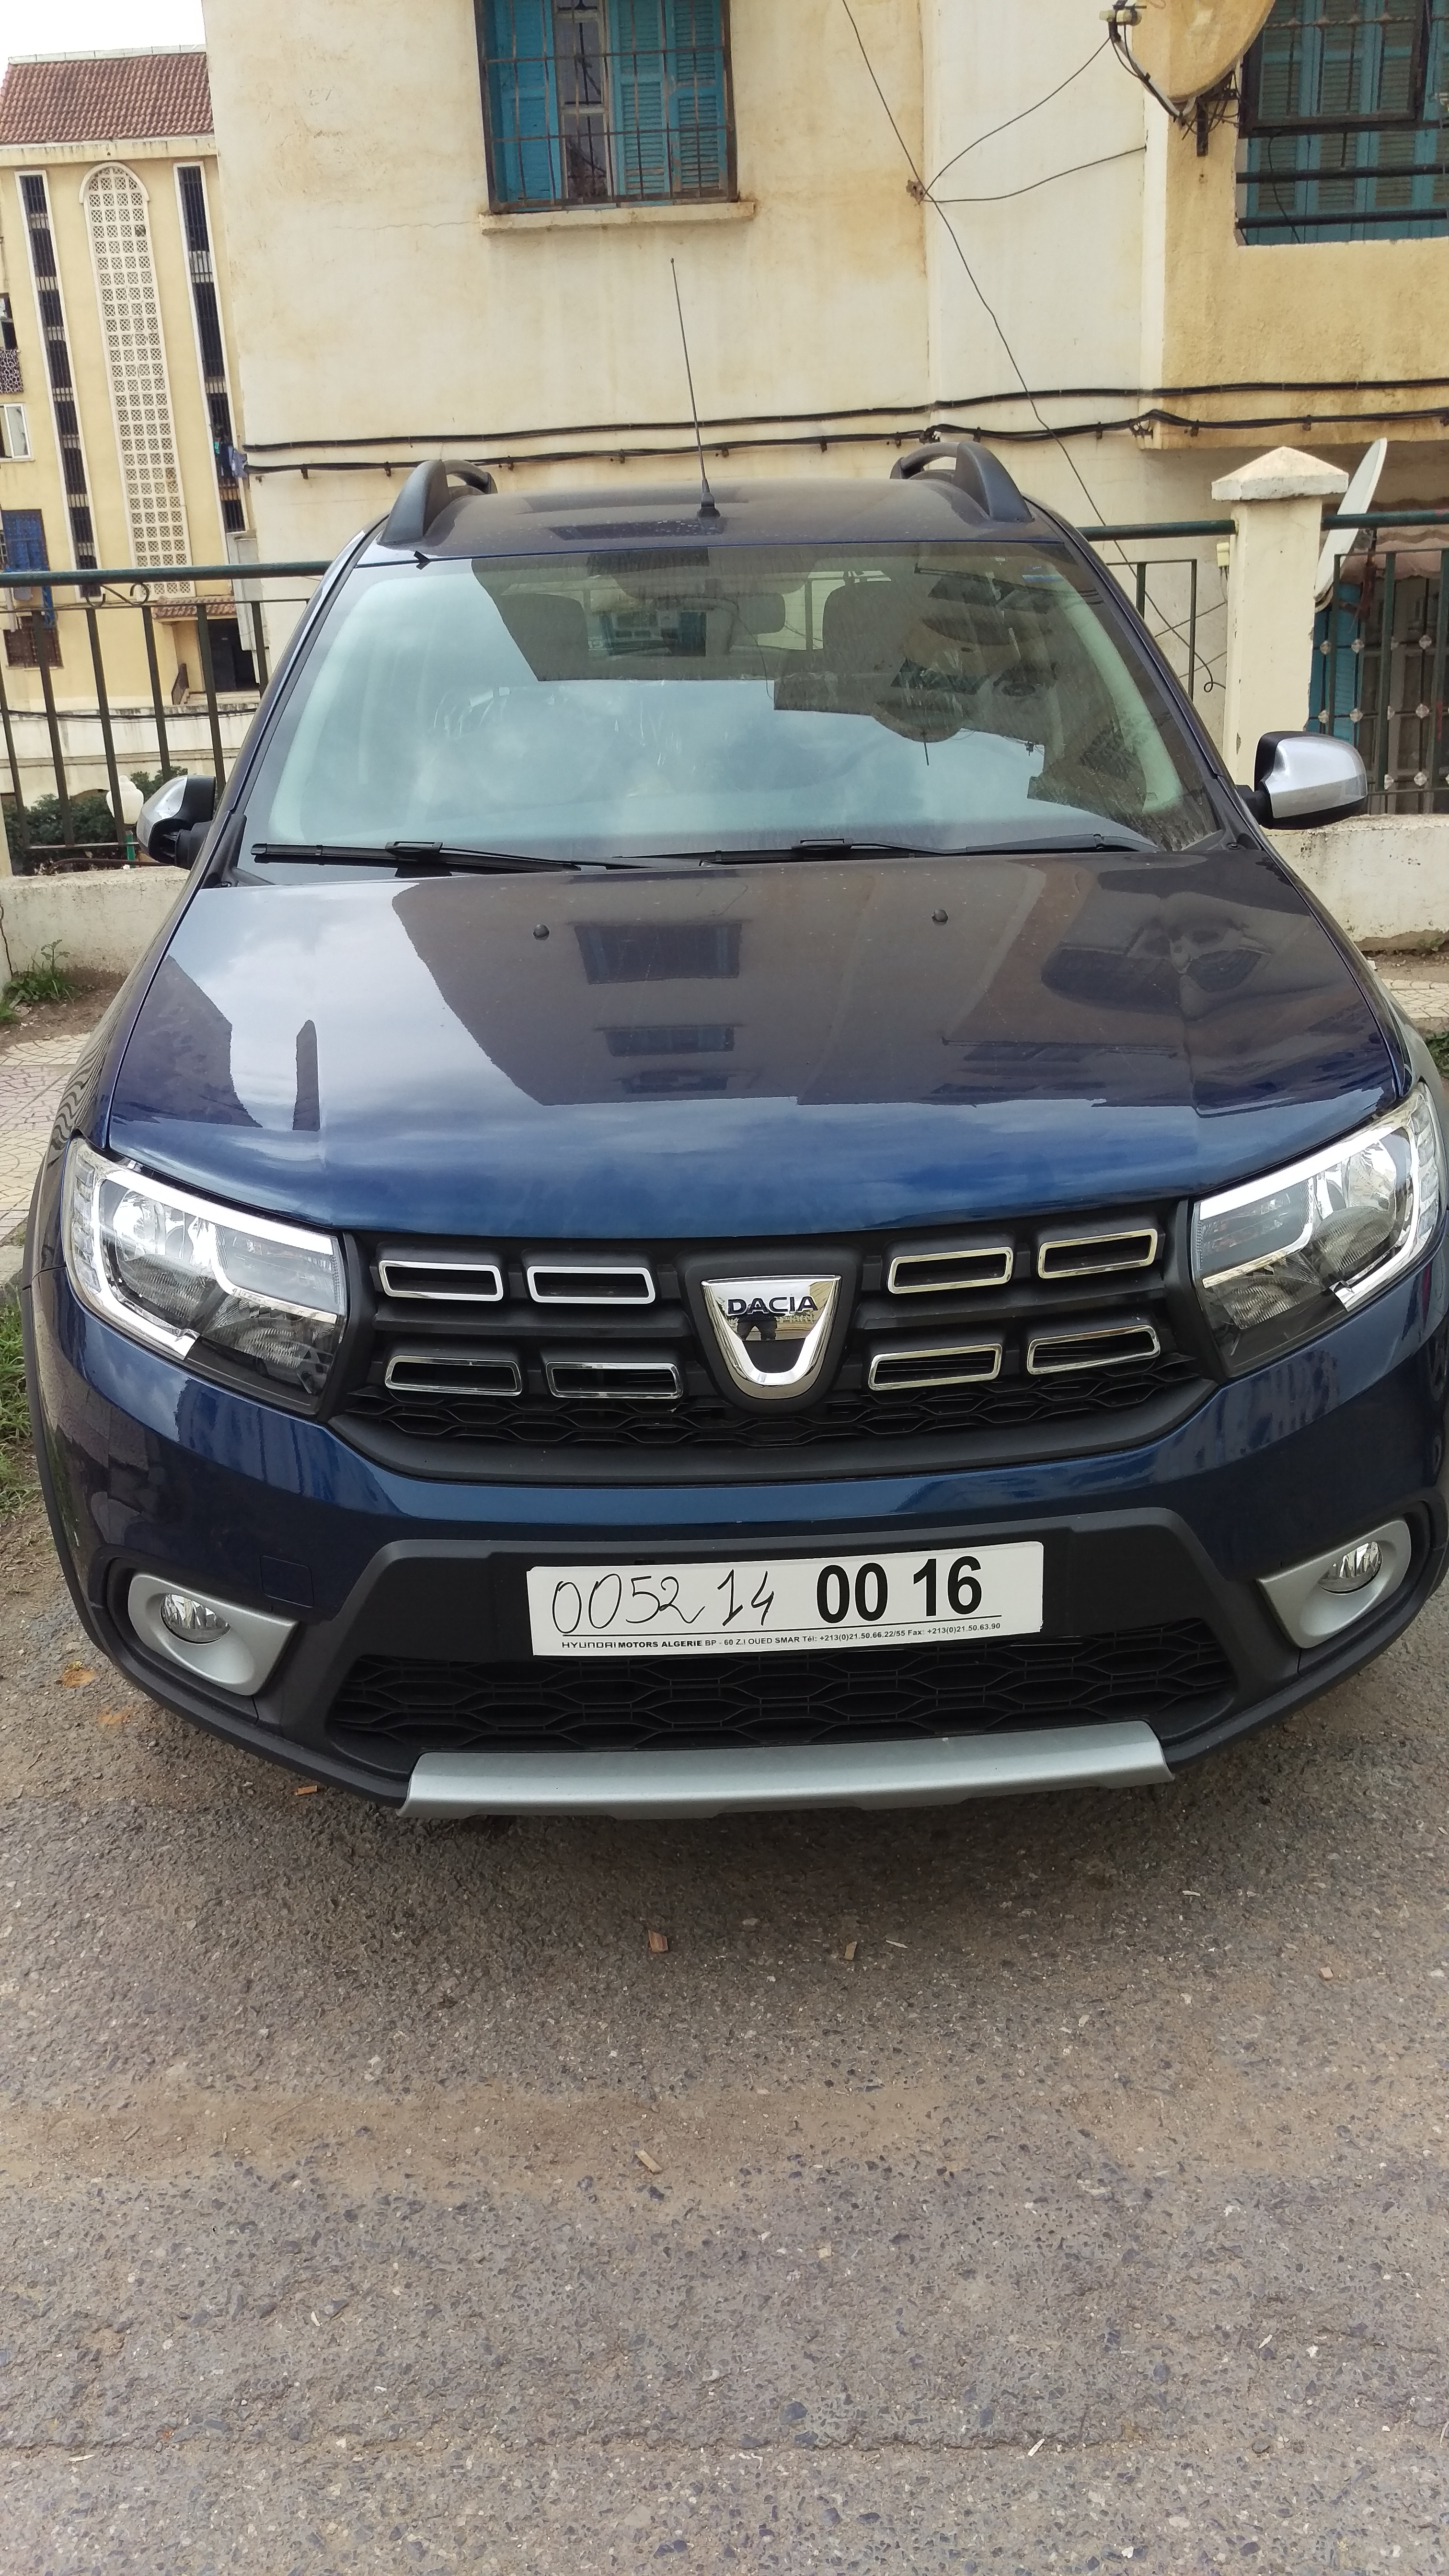 Dacia sandero ouedkniss